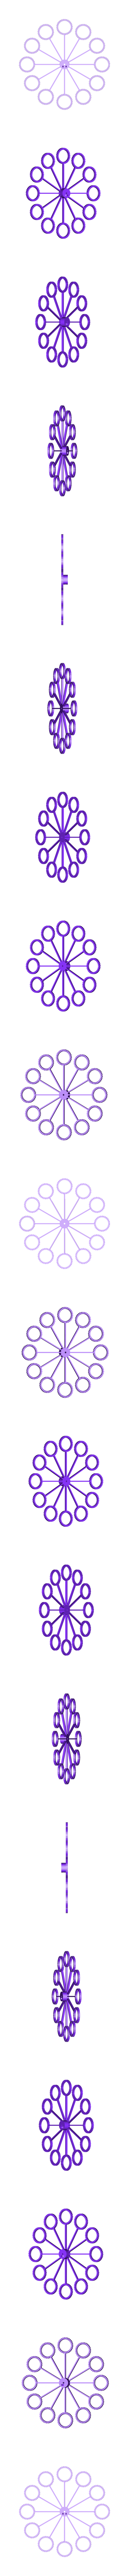 bubble_wheel.stl Download free STL file The Bicycle Bubble Machine • 3D print design, Istareyn